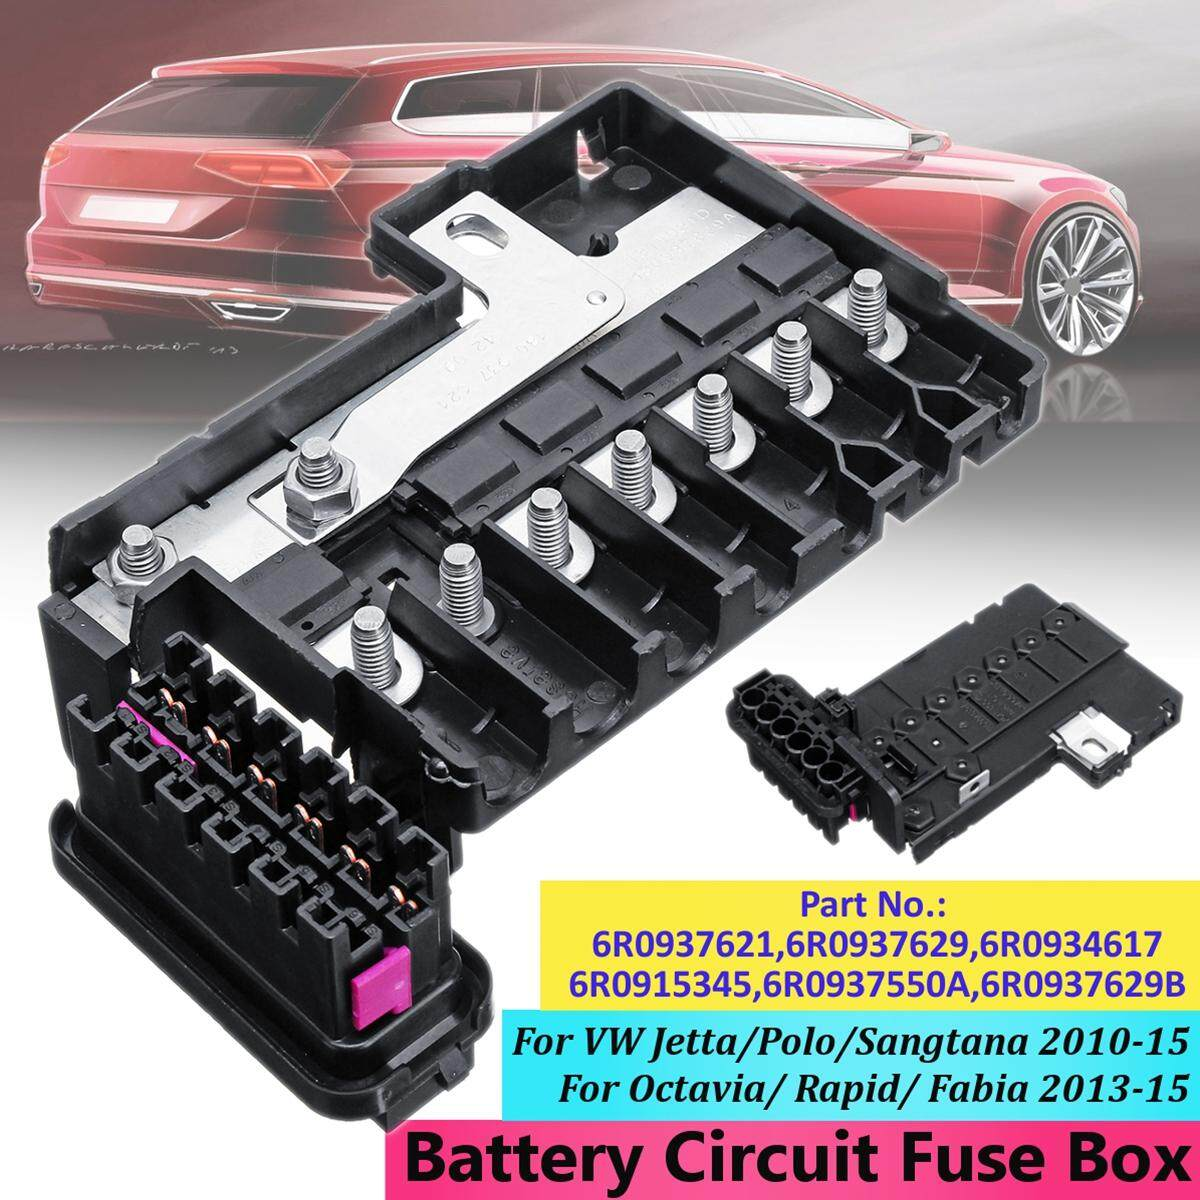 【free Shipping + Flash Deal】bat-Tery Circuit Fuse Box For Vw/ Octavia/ Rapid/ Fabia 6r0937621/6r0934617 By Freebang